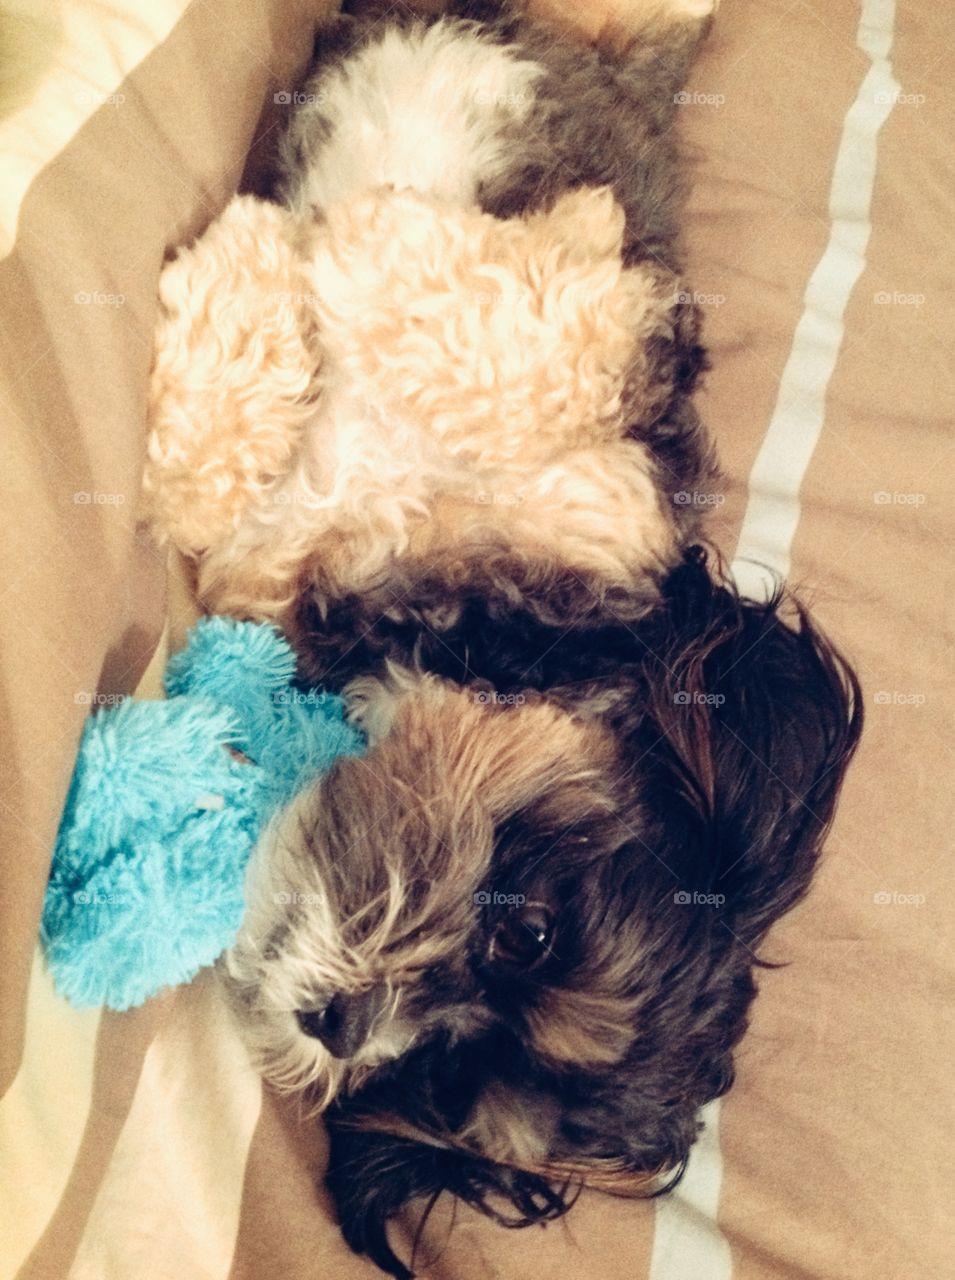 Cute Dog Lazing